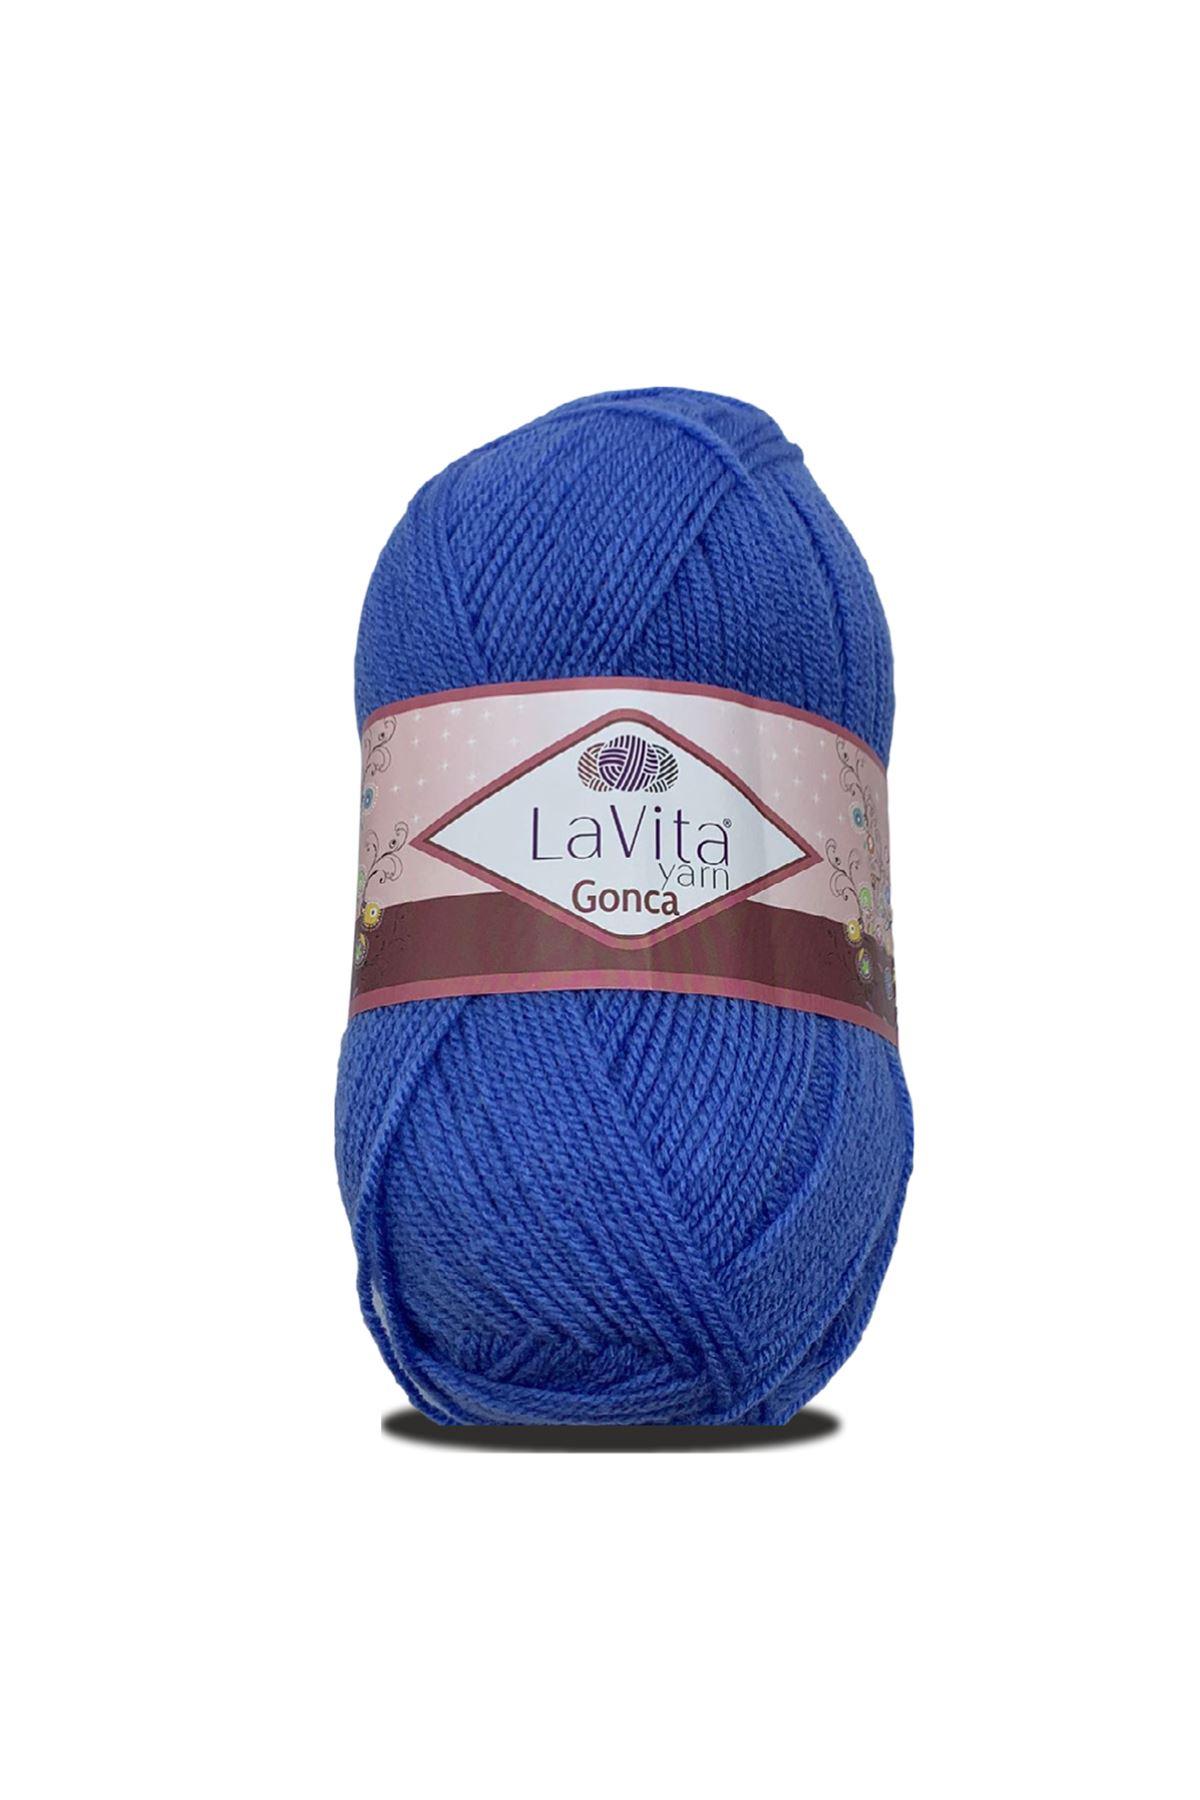 Lavita Gonca 5037 Orta Mavi